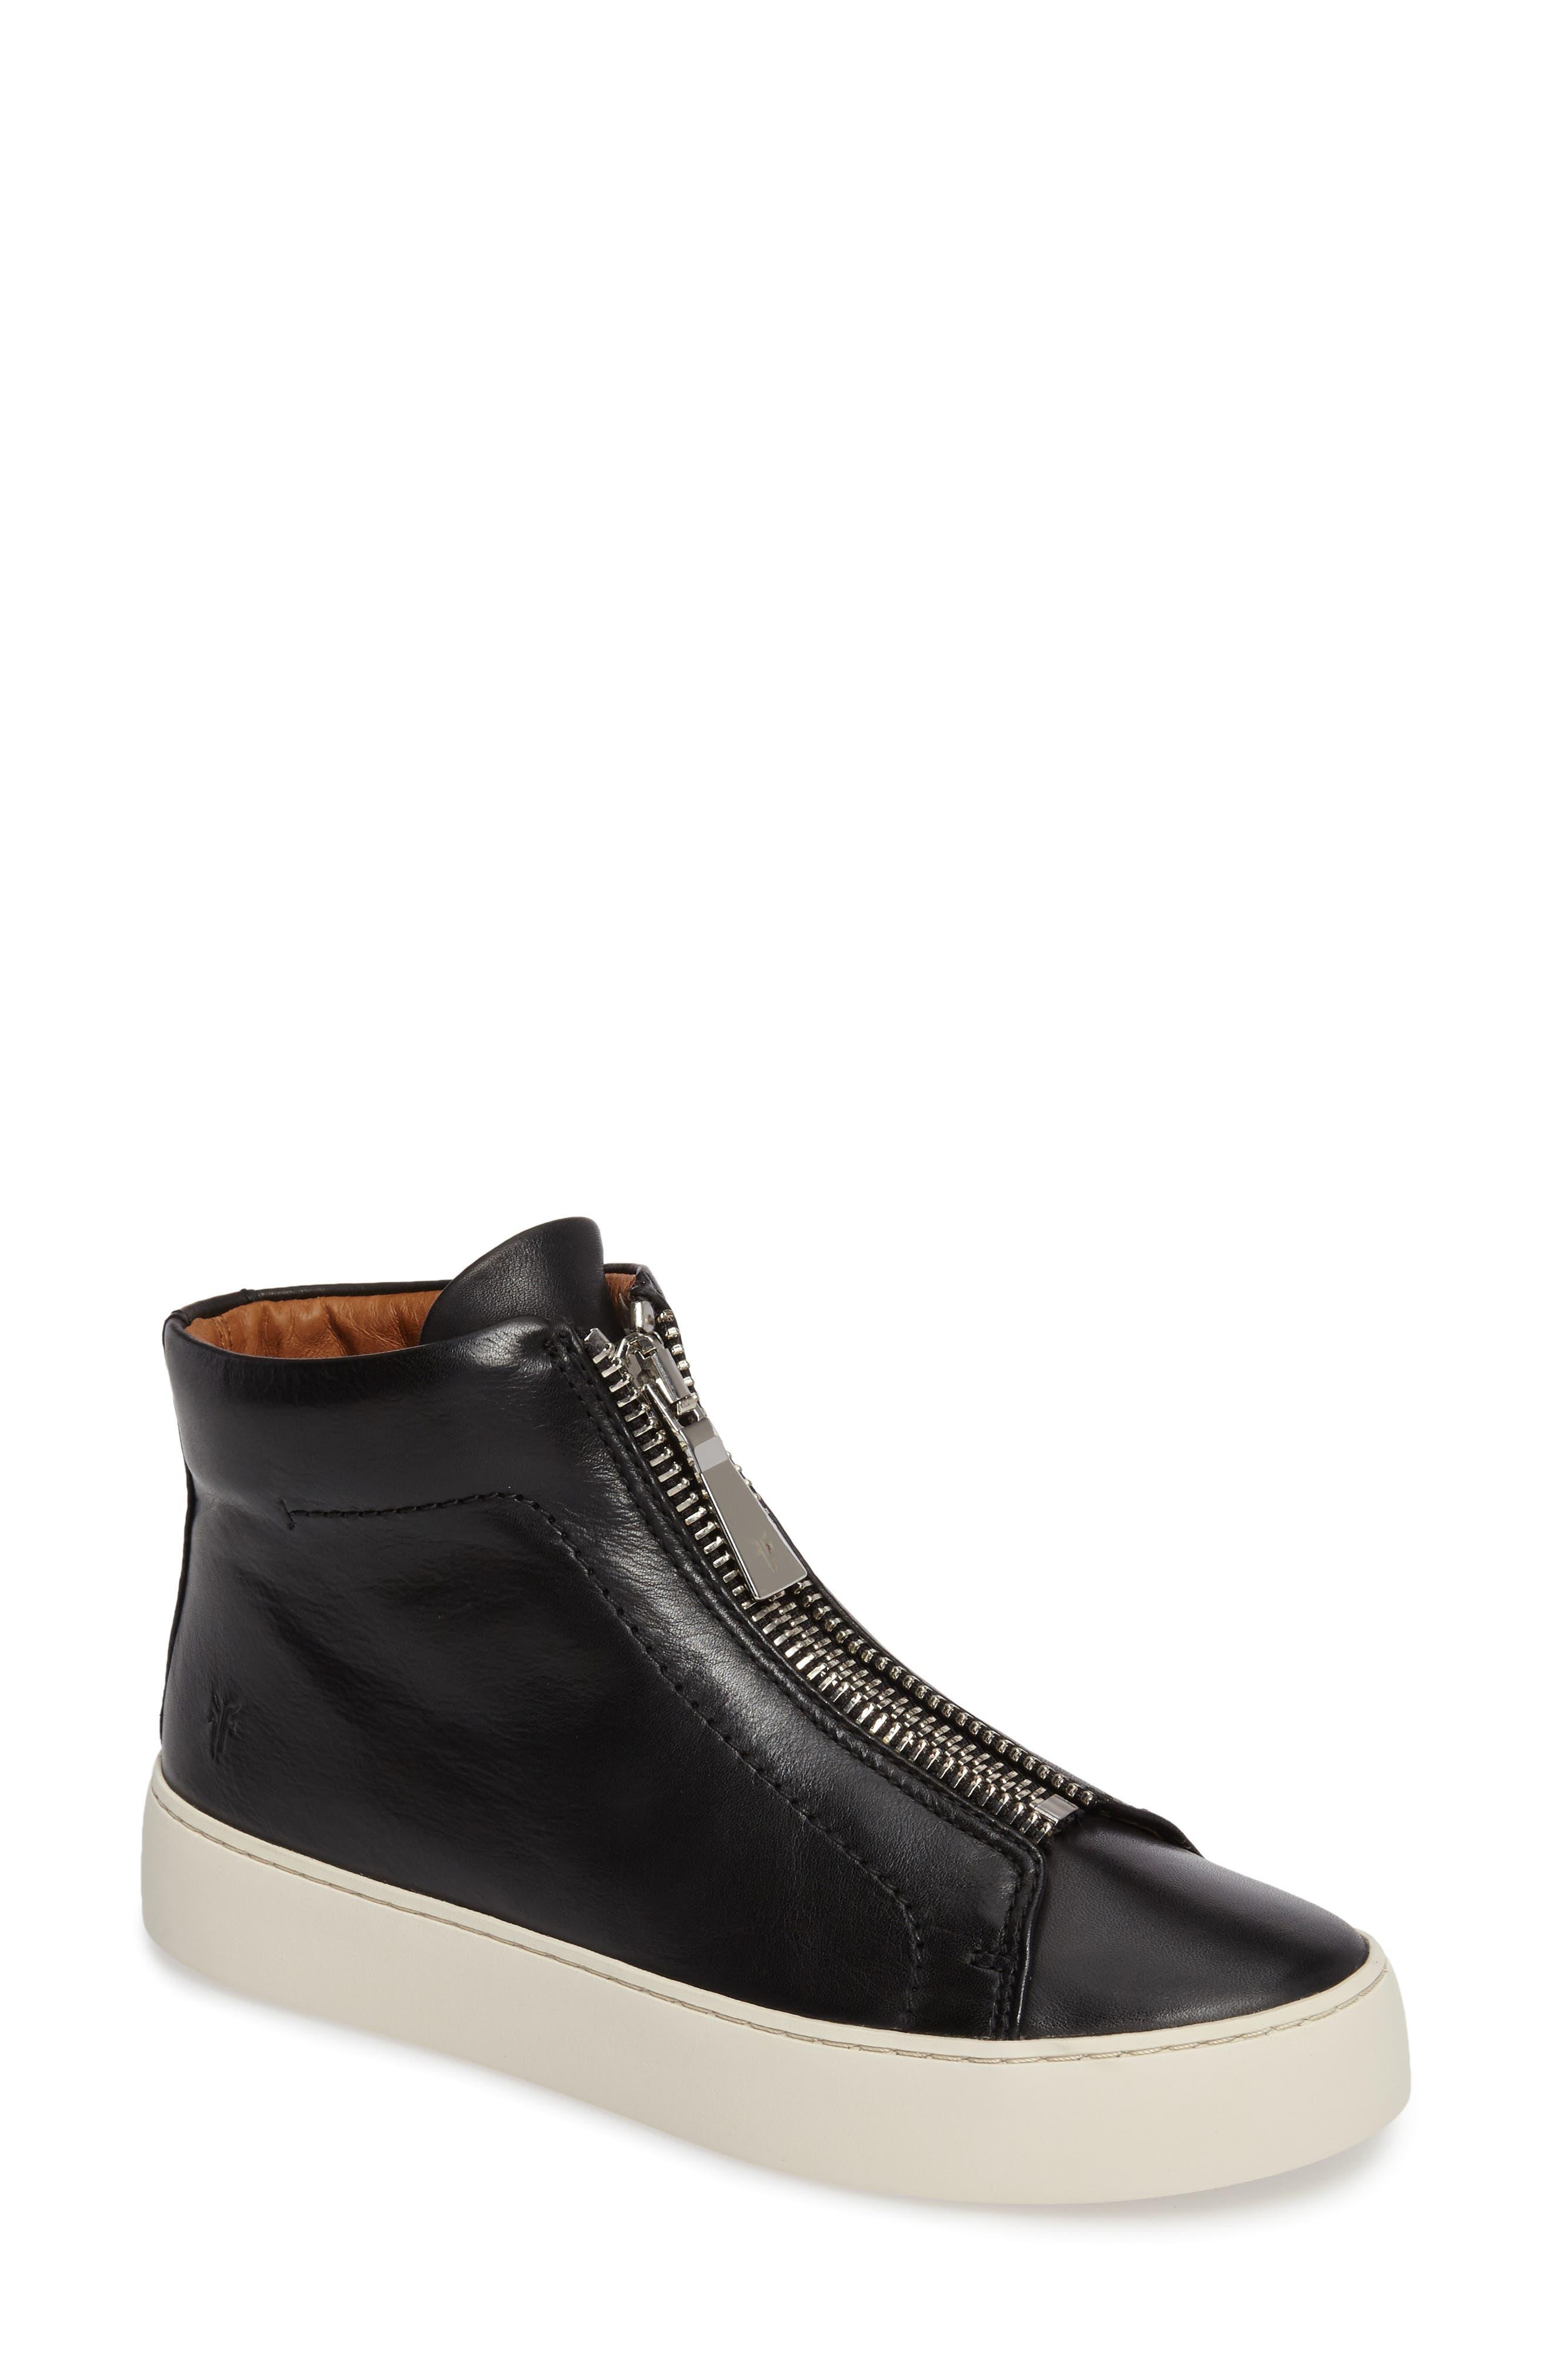 Alternate Image 1 Selected - Frye Lena Zip High Top Sneaker (Women)